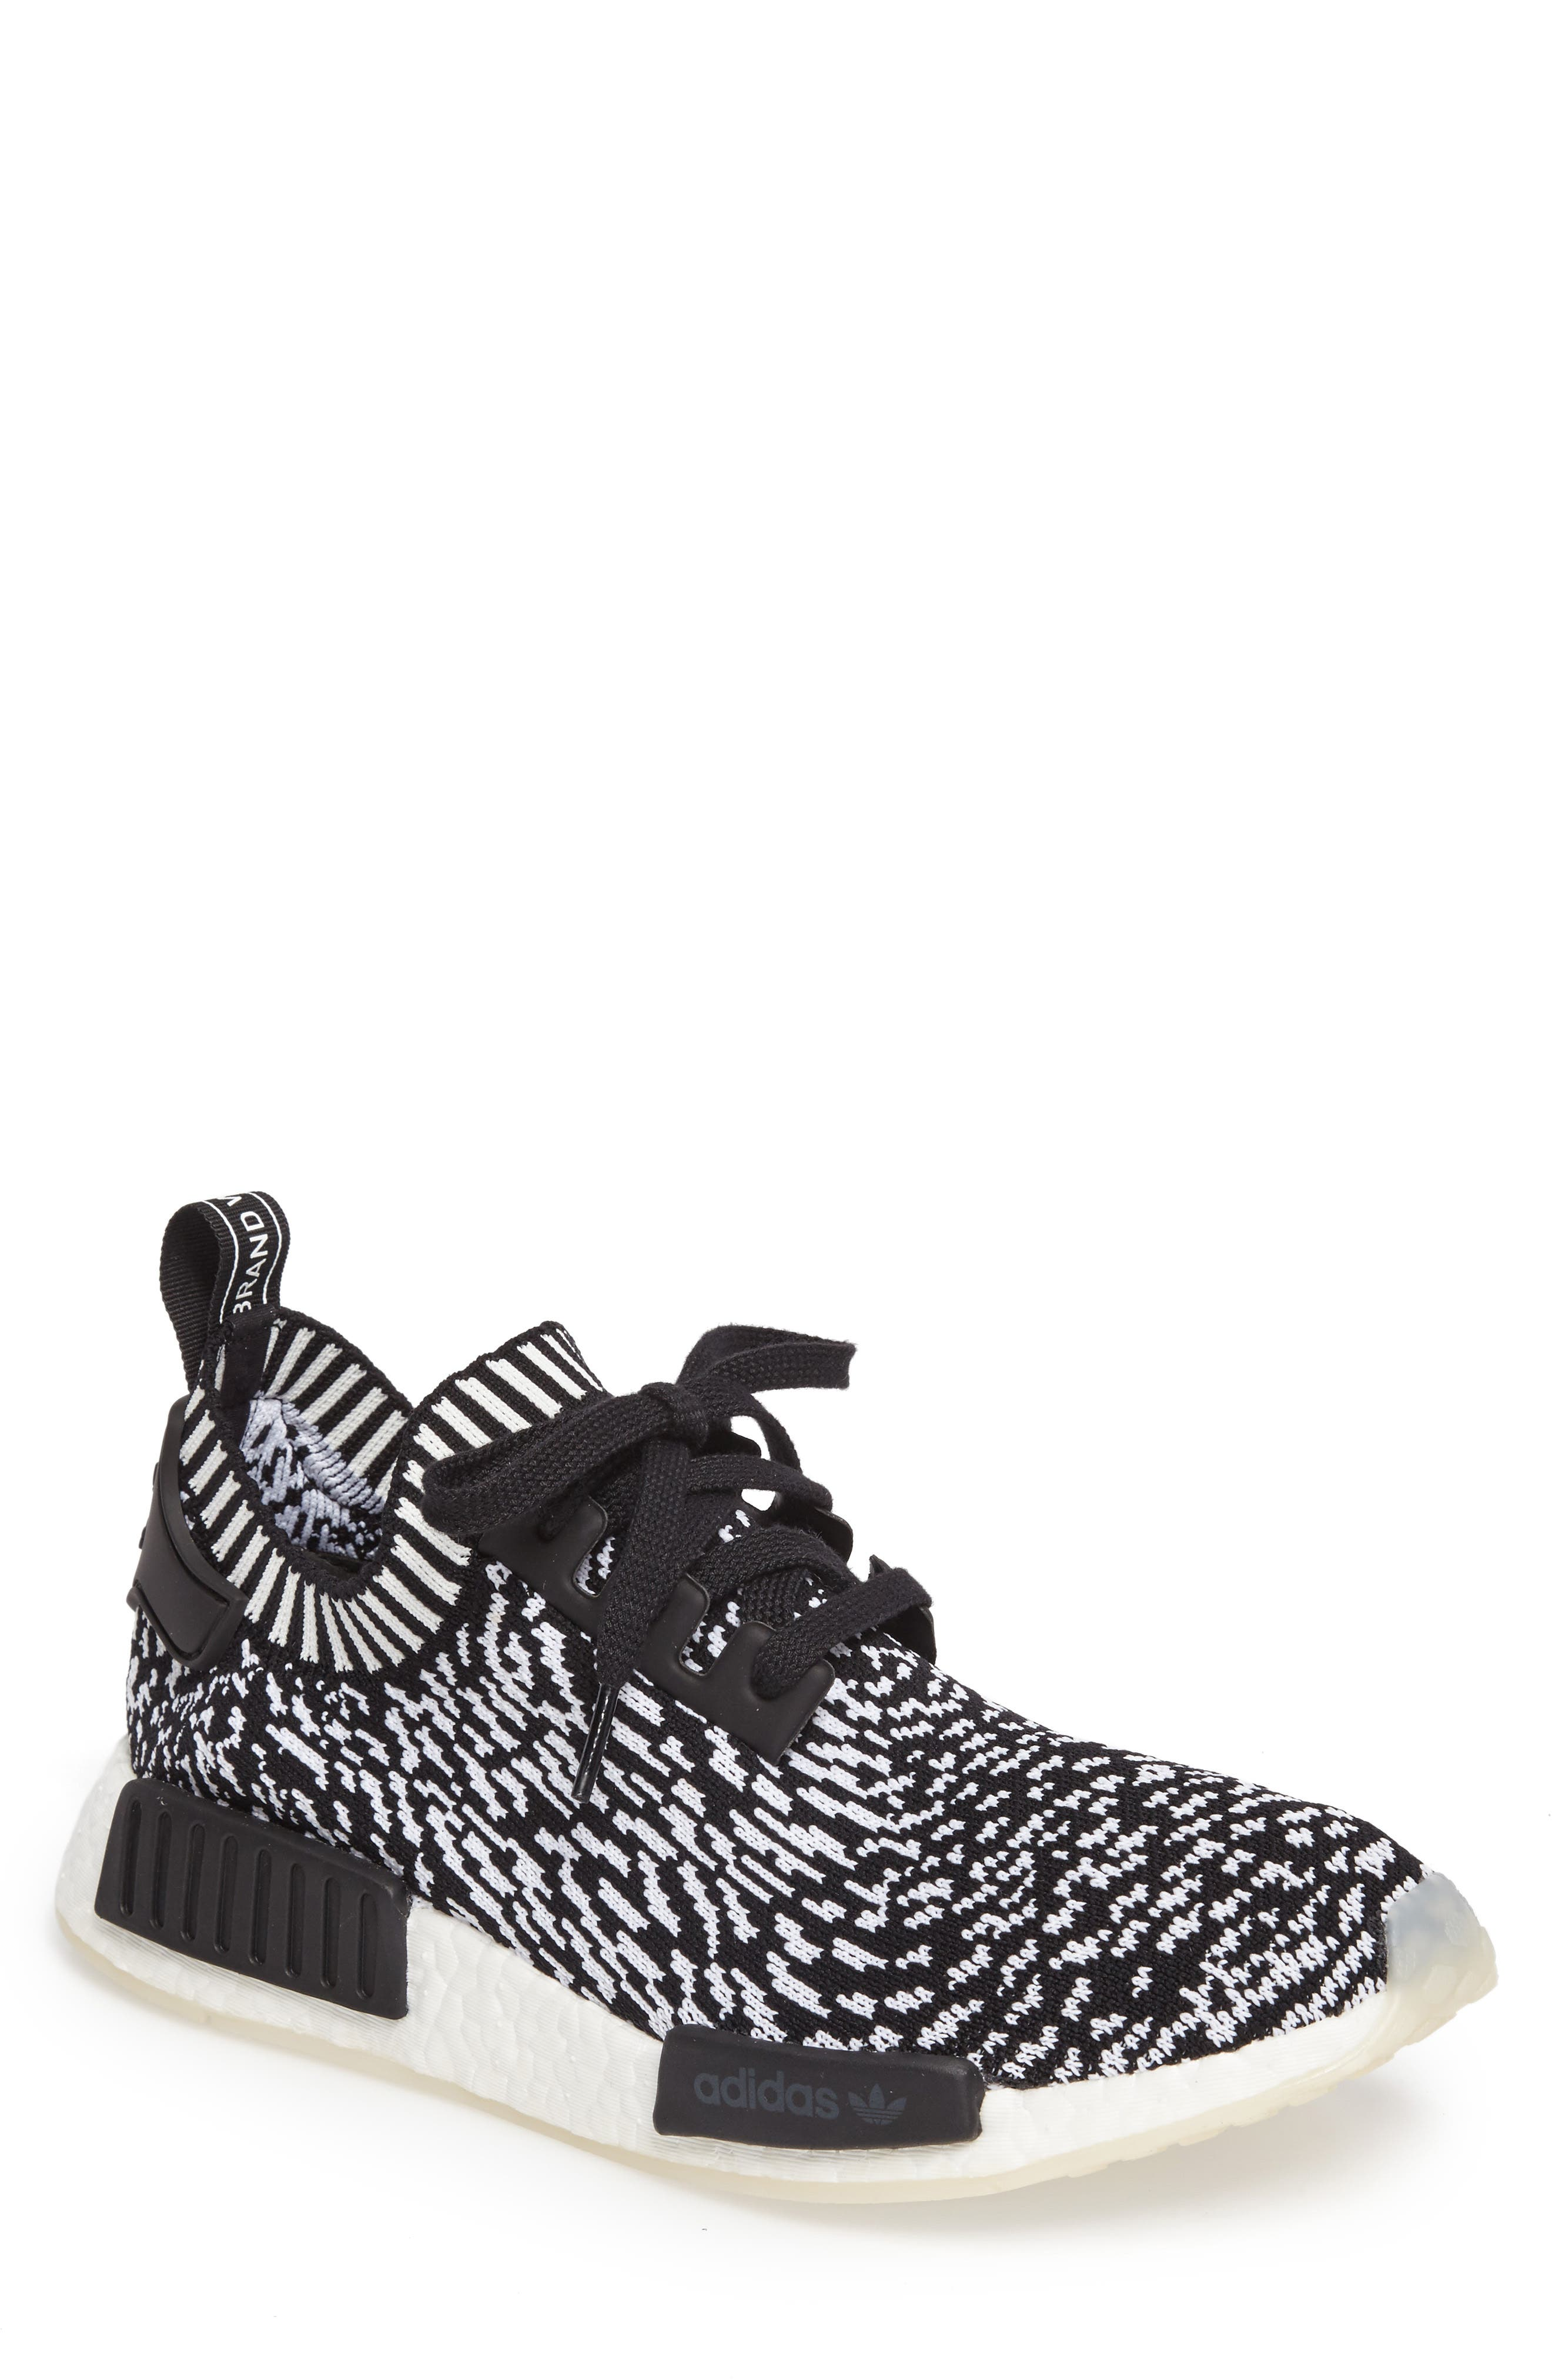 NMD R1 Primeknit Sneaker,                             Main thumbnail 1, color,                             Core Black/ Core Black/ White